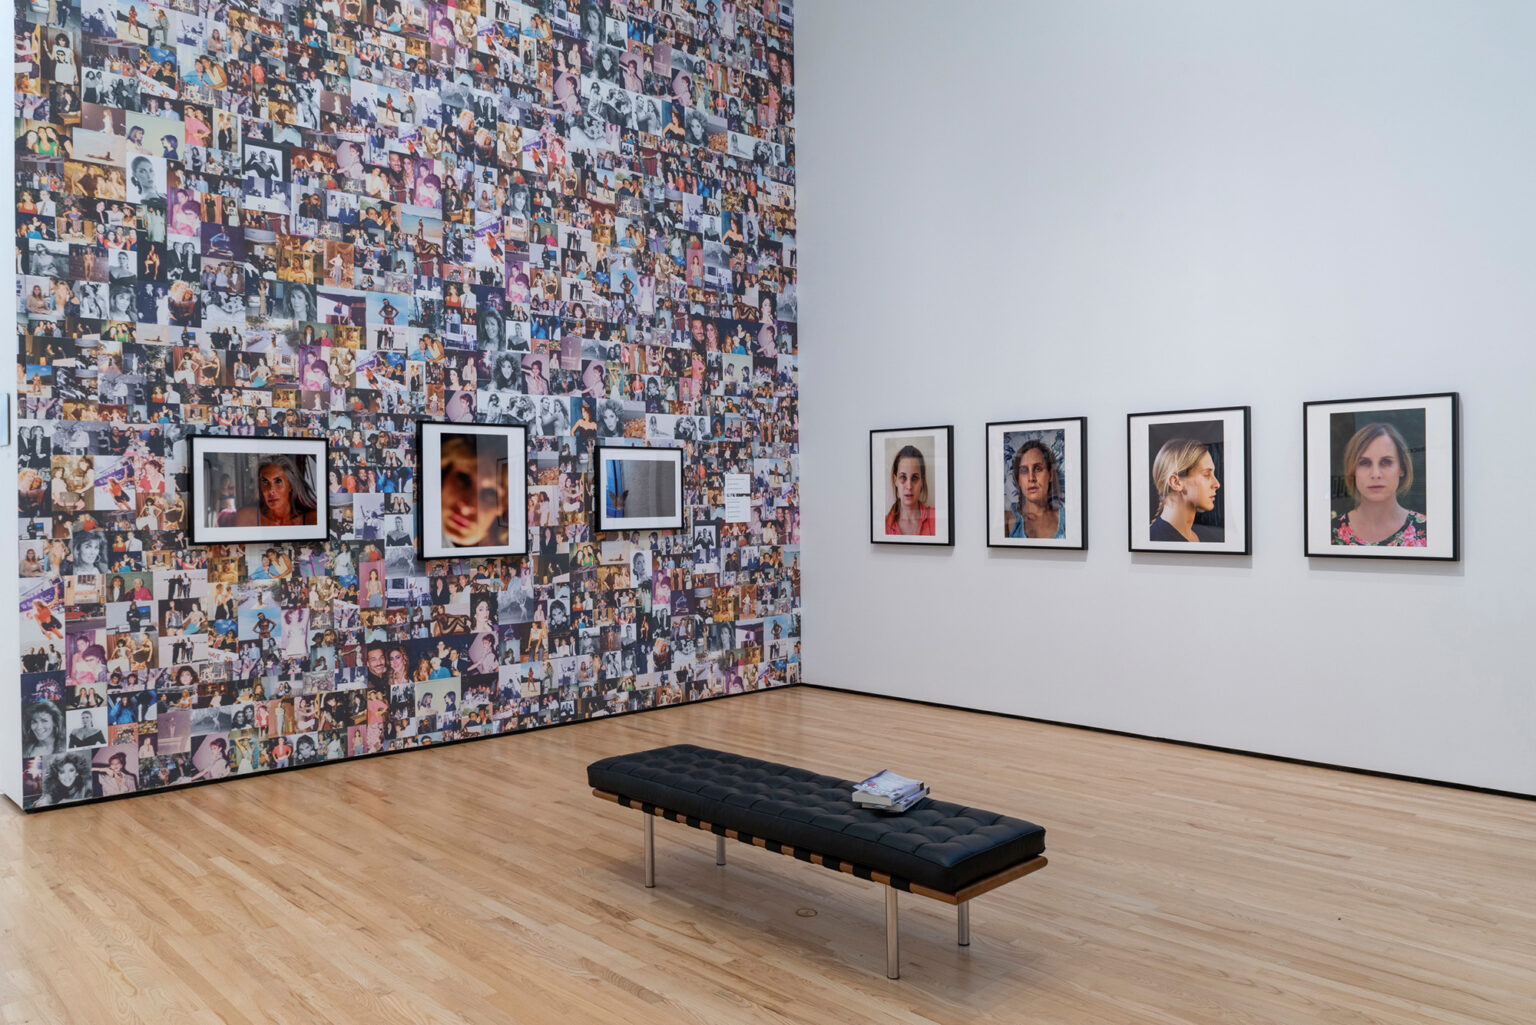 Installation view, Zackary Drucker: Icons. Photo by Mitro Hood